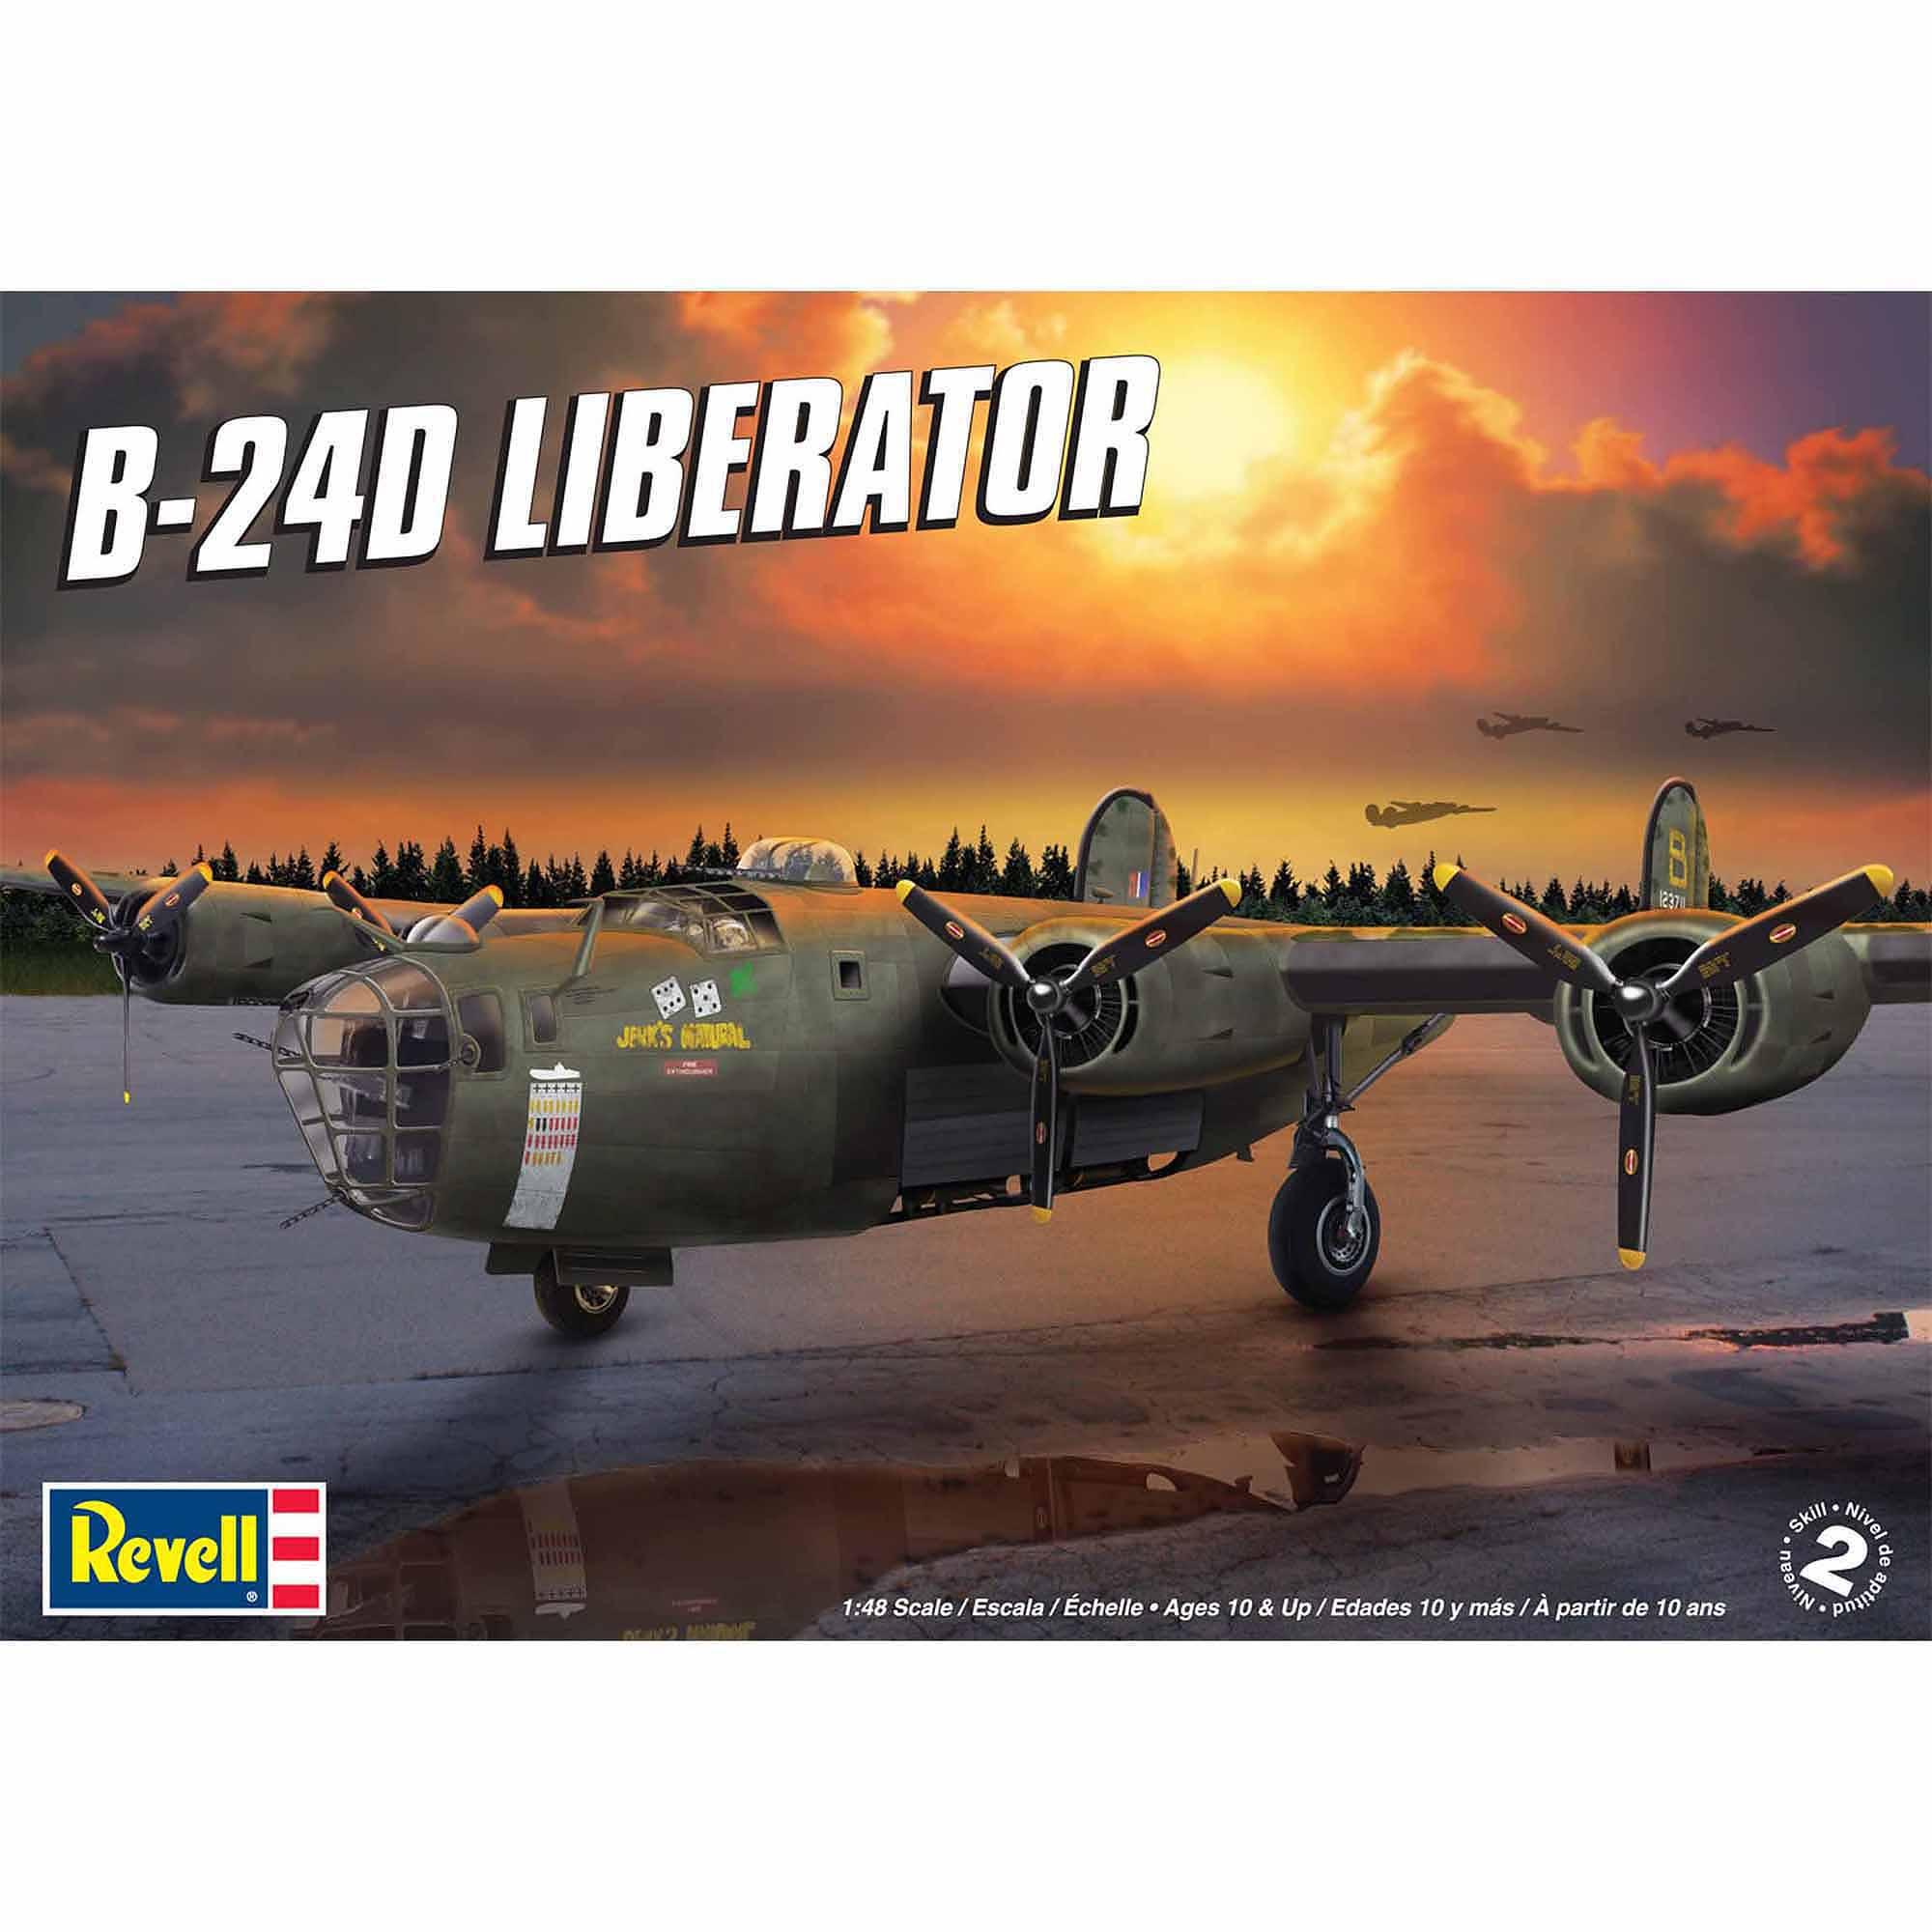 Revell 1:48 Scale B-24D Liberator Model Kit